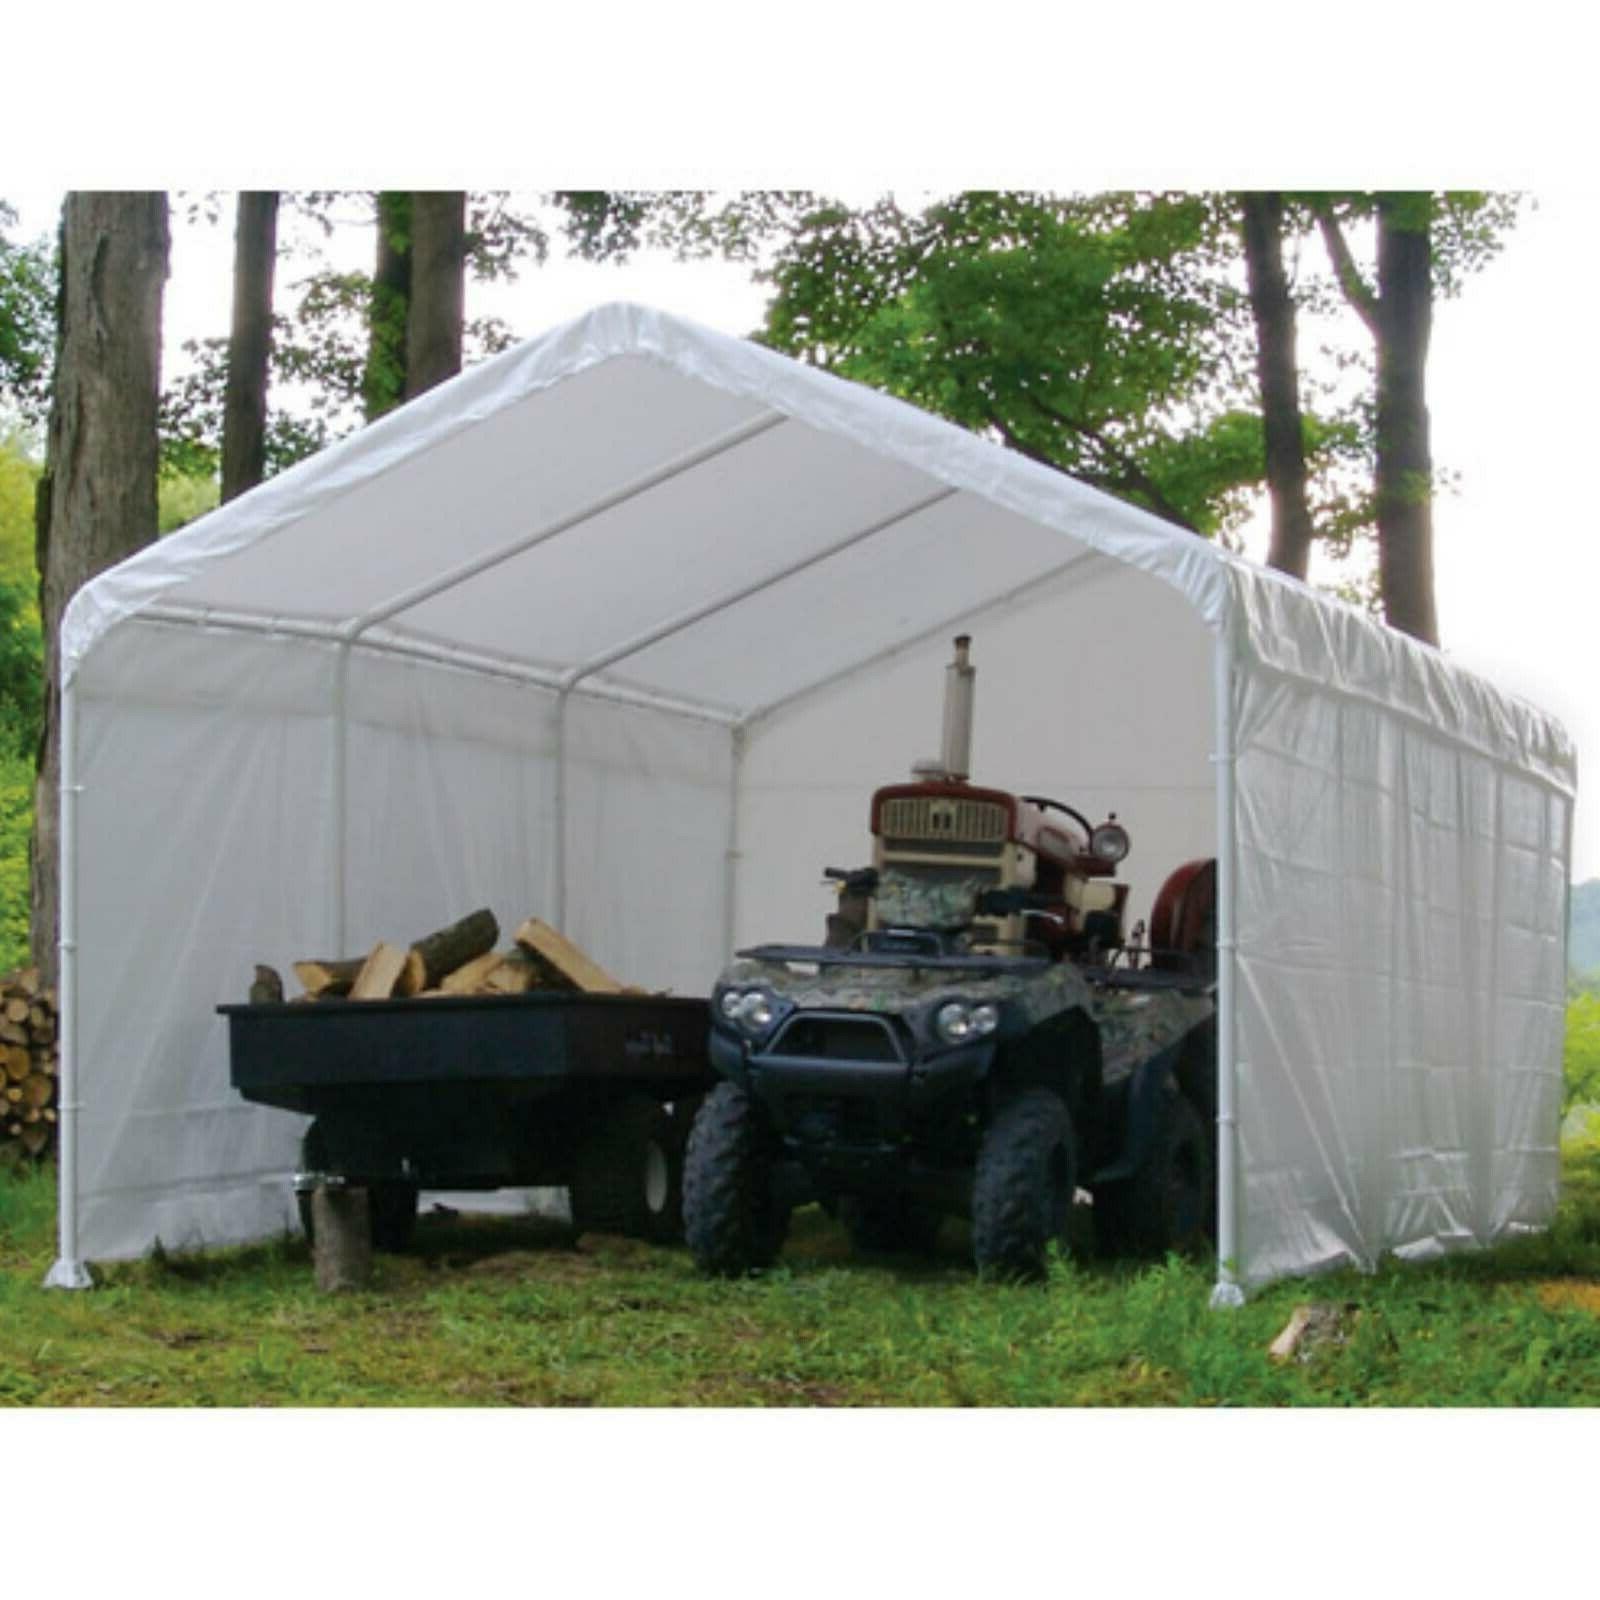 Canopy Enclosure Shelter Portable UV Protection Garage Car Port